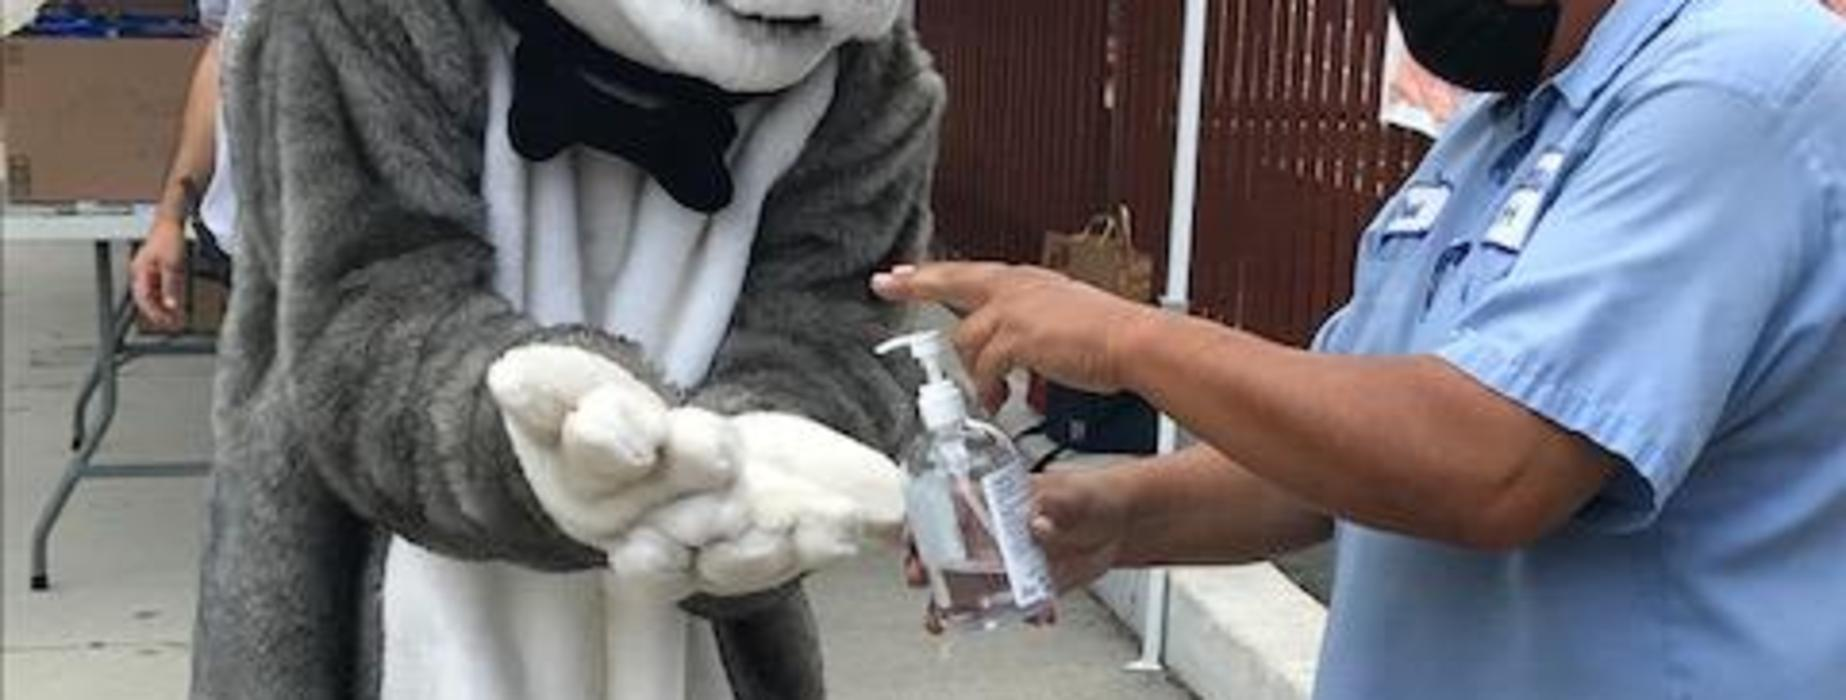 Marguerita Husky uses hand sani